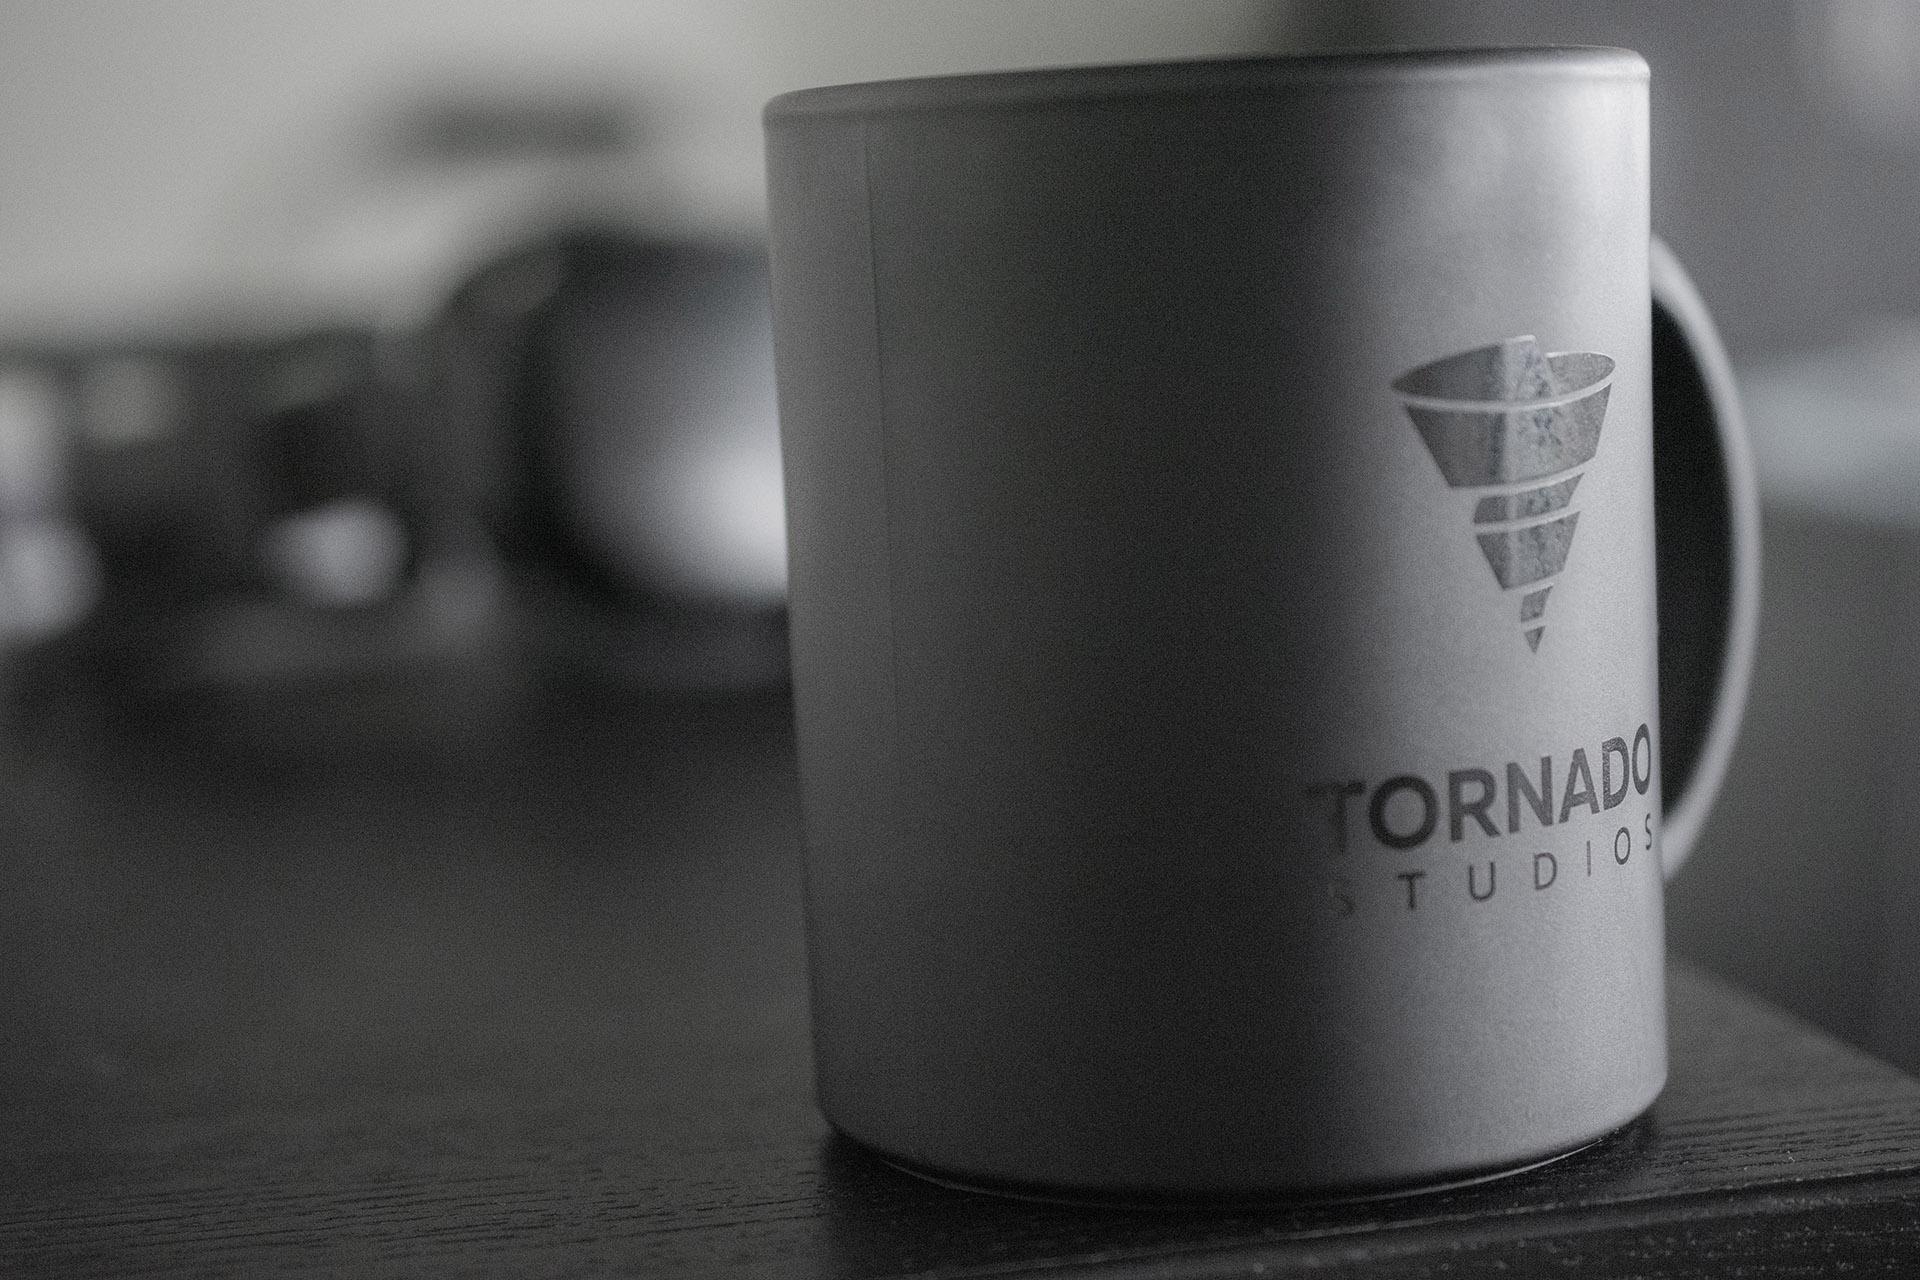 Tornado Studios